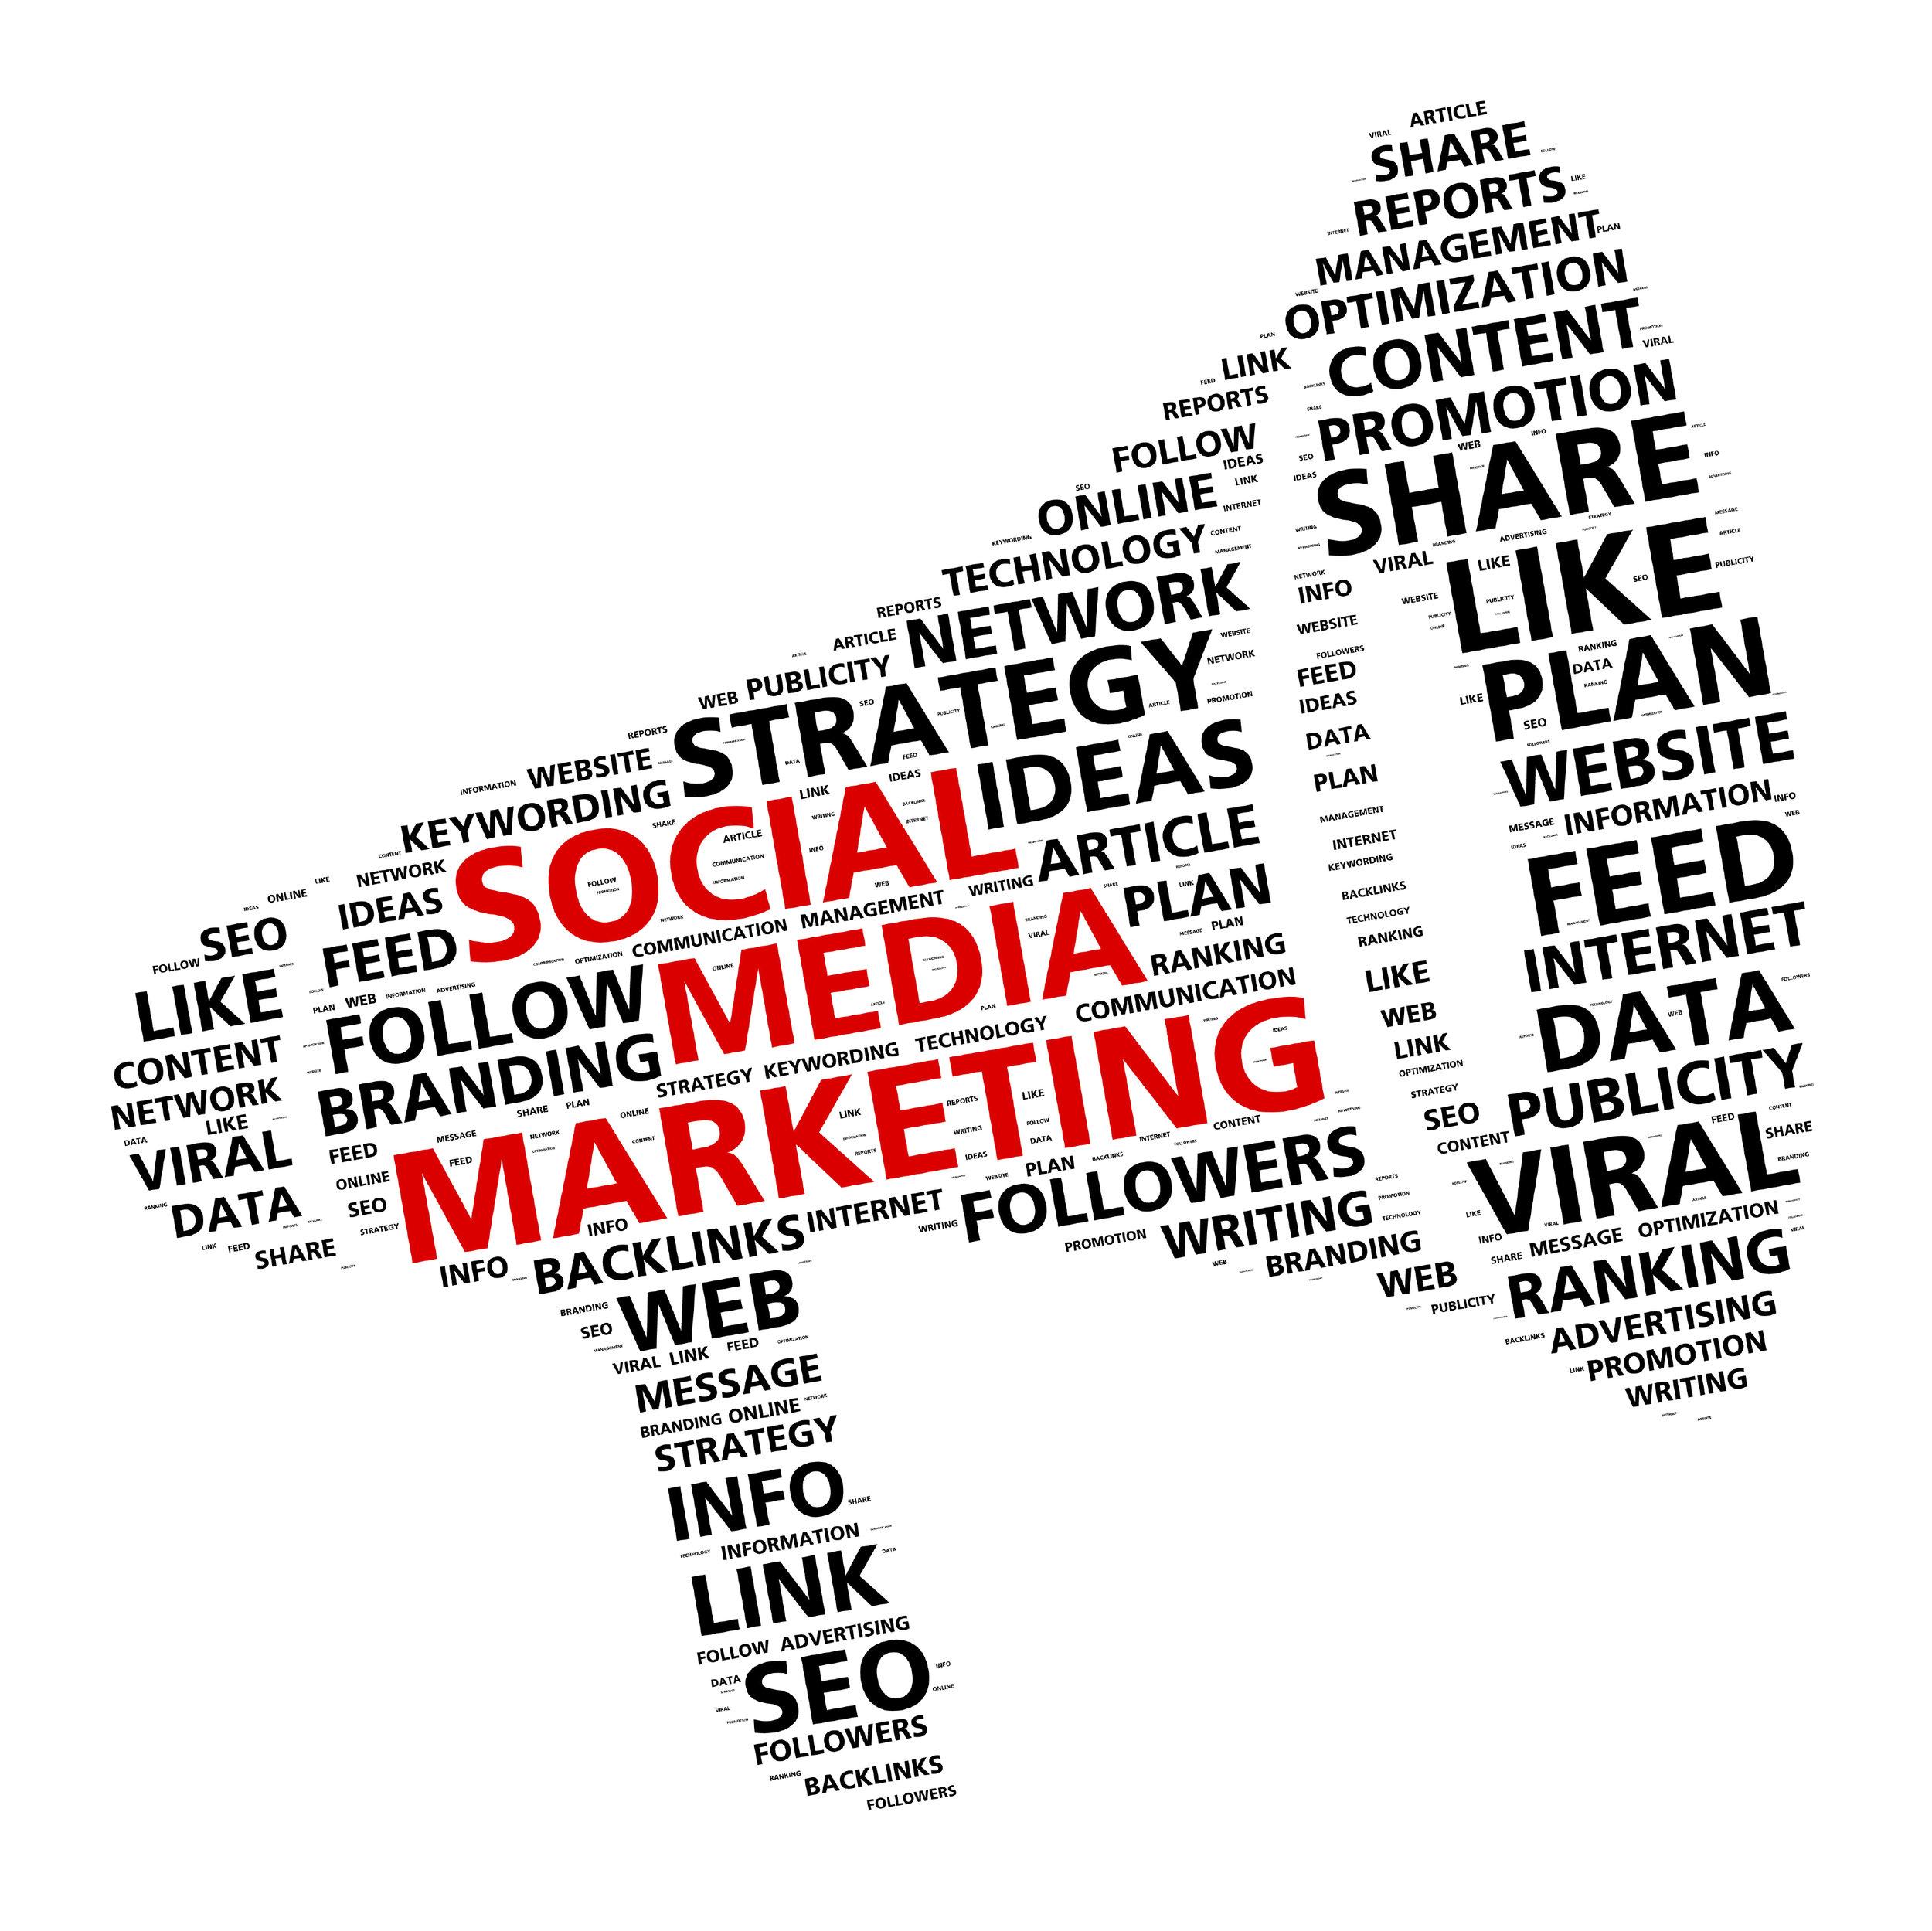 Social-media-marketing-word-cloud-in-shape-of-a-megaphone-000073325337_Full.jpg